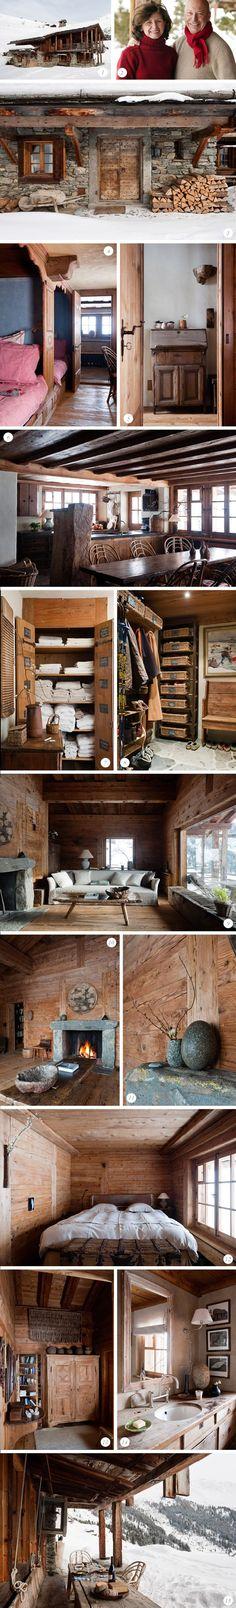 Rustic Cabin: